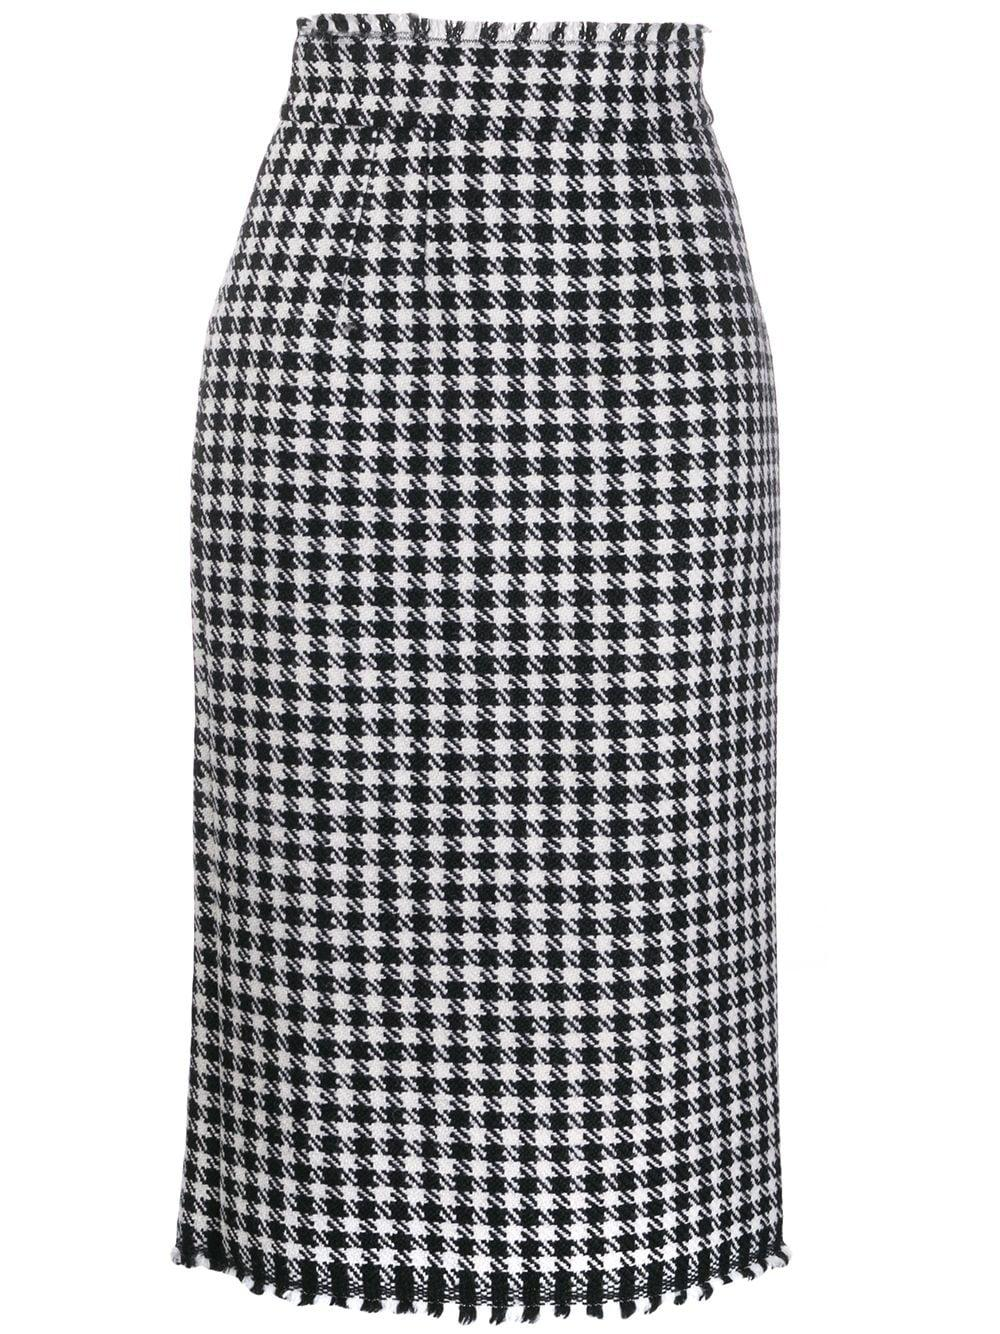 Dolce & Gabbana юбка мини в ломаную клетку